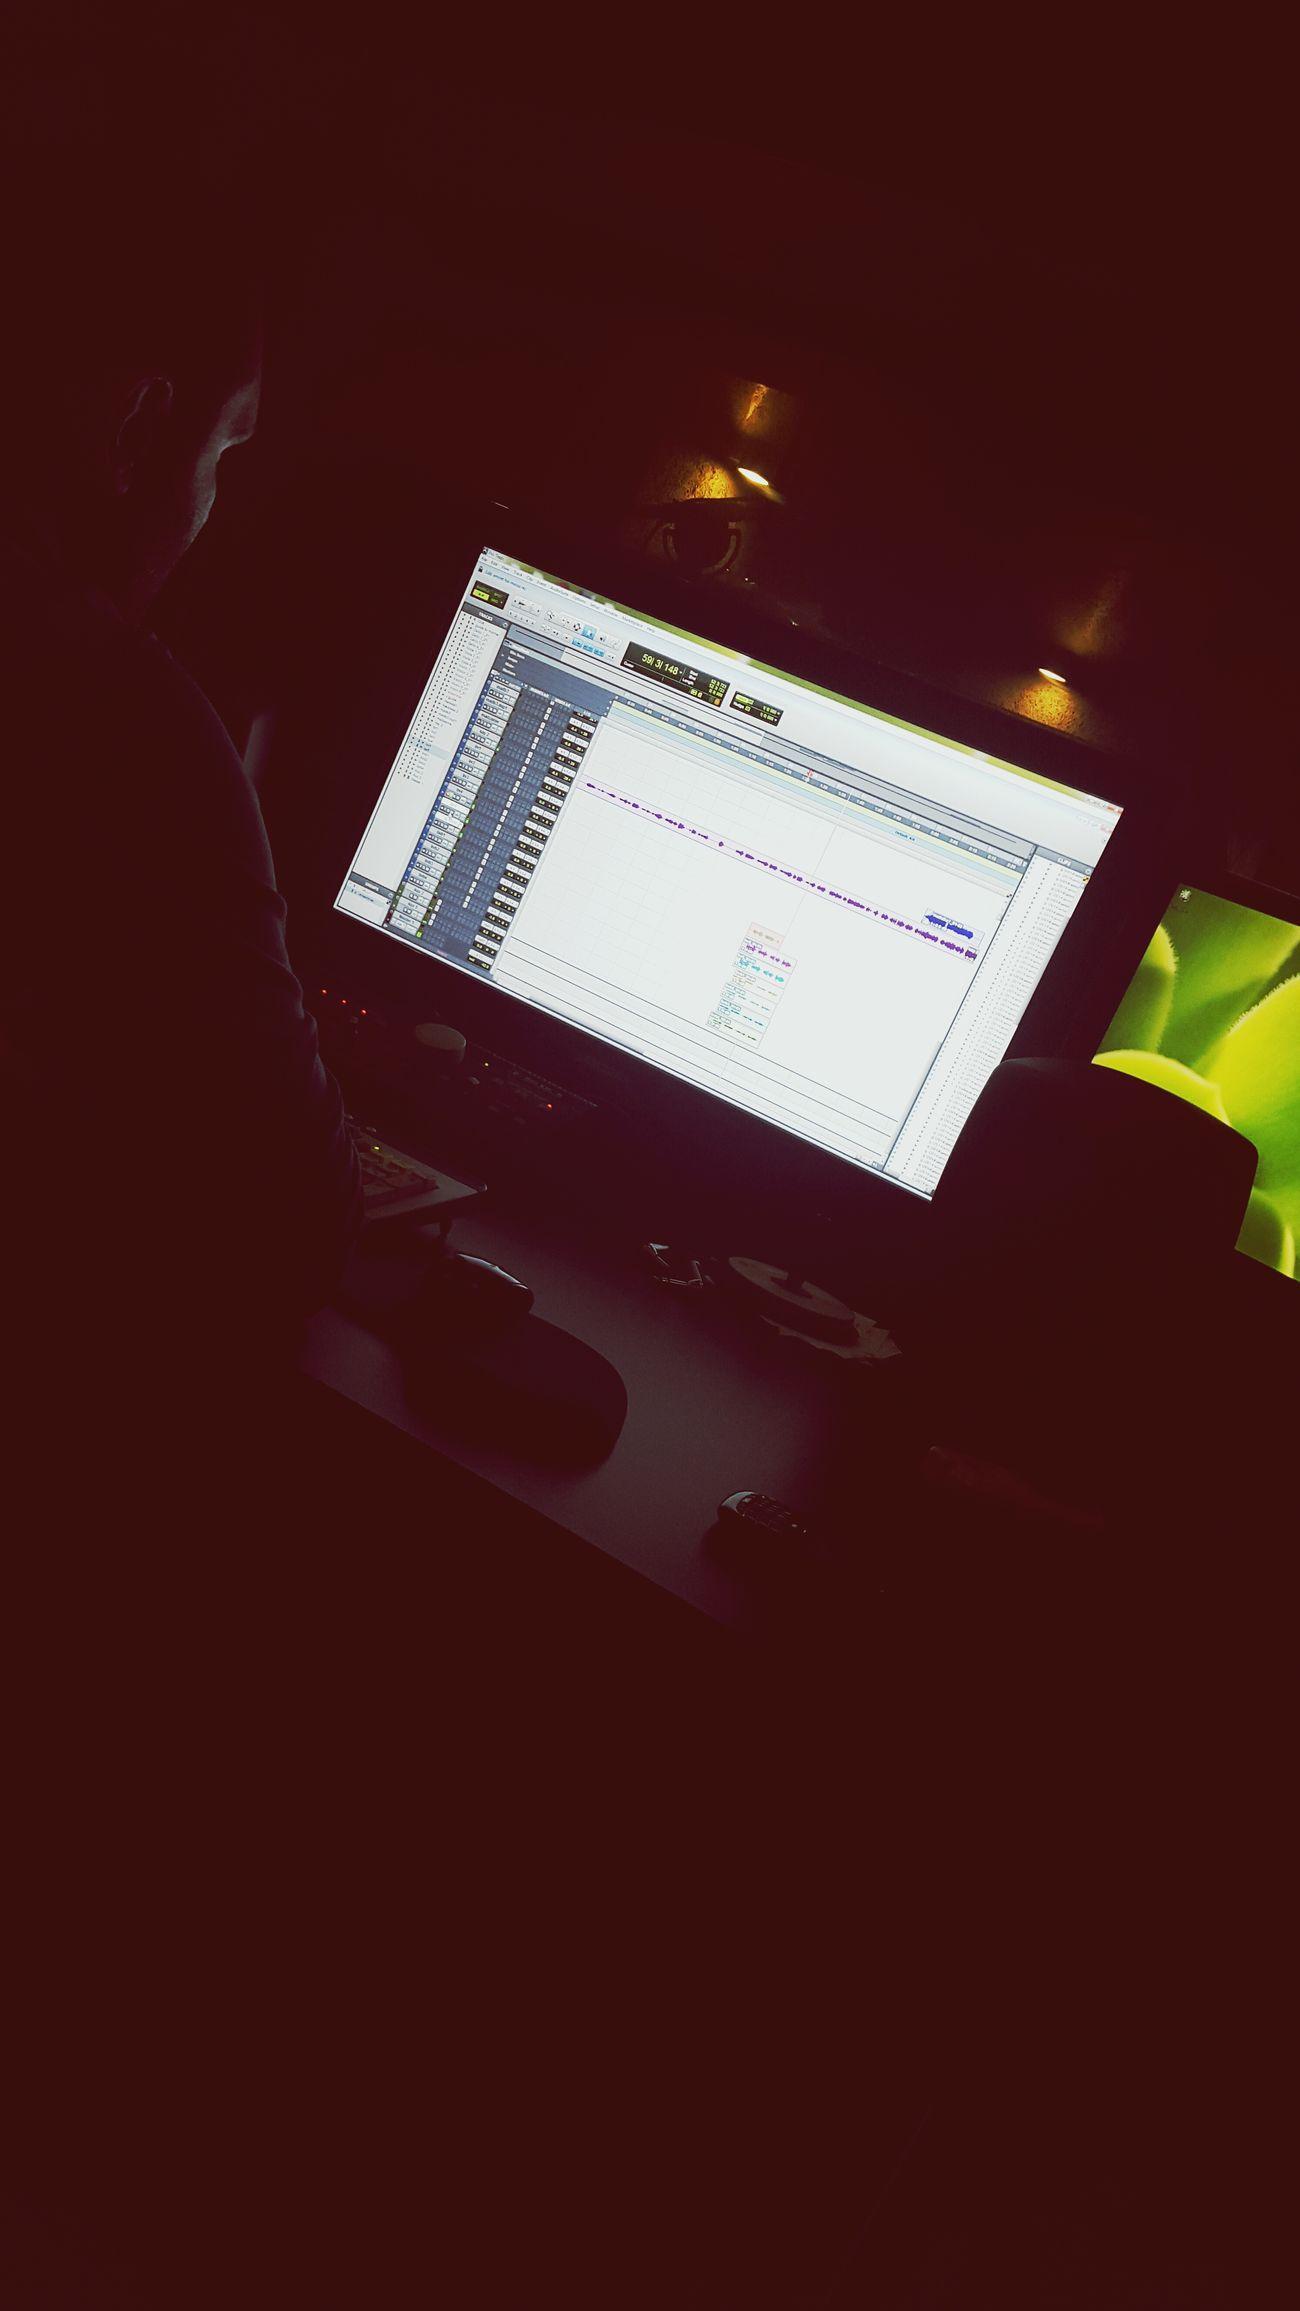 The Week On EyeEm Taking Photos Studio Enjoying Life Music Ramichalhoub New Hits Music Is My Life New Album Happiness